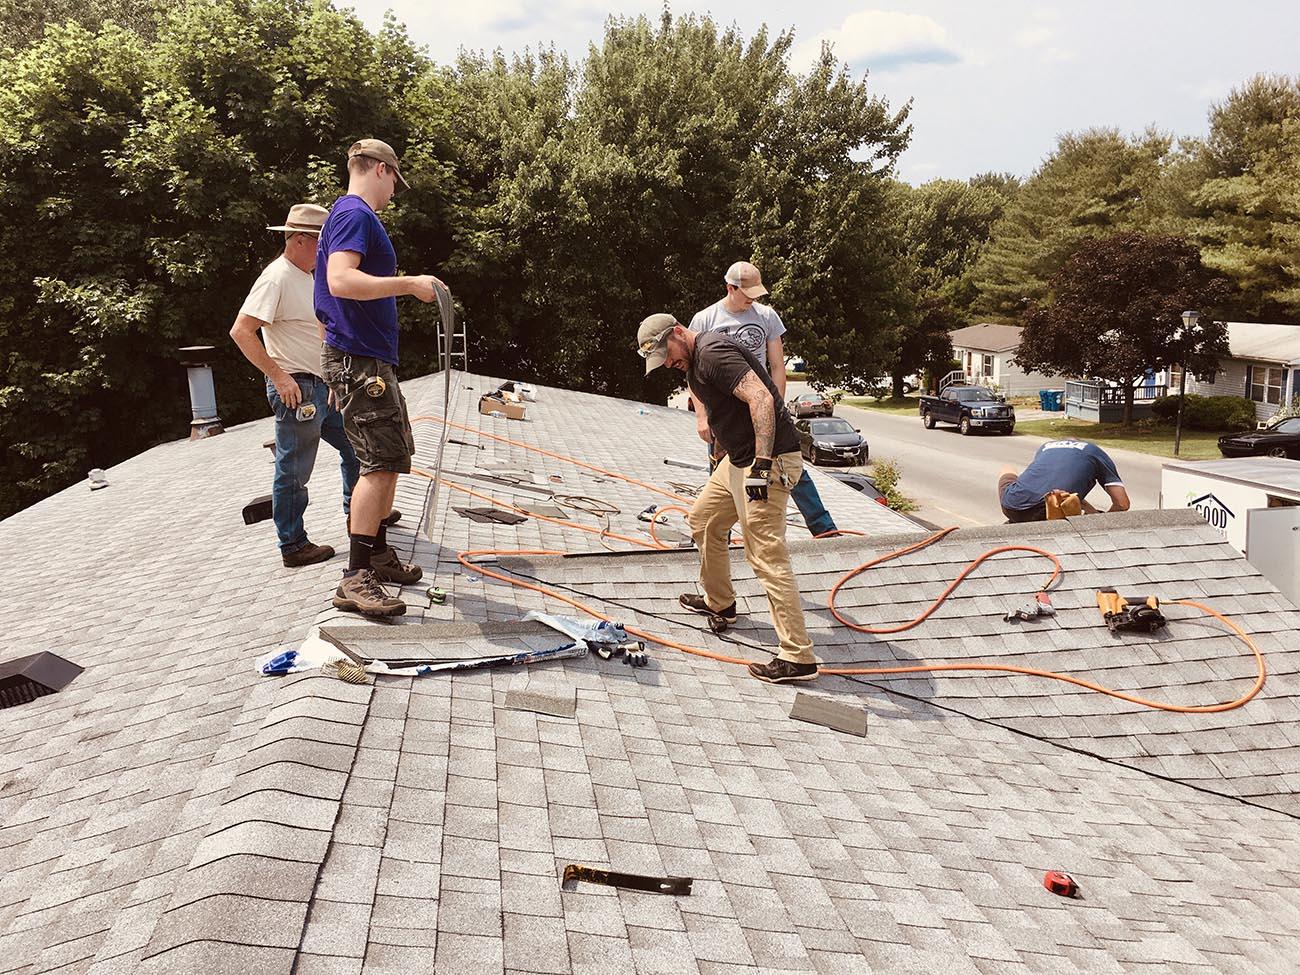 roofing job WJBQXW9